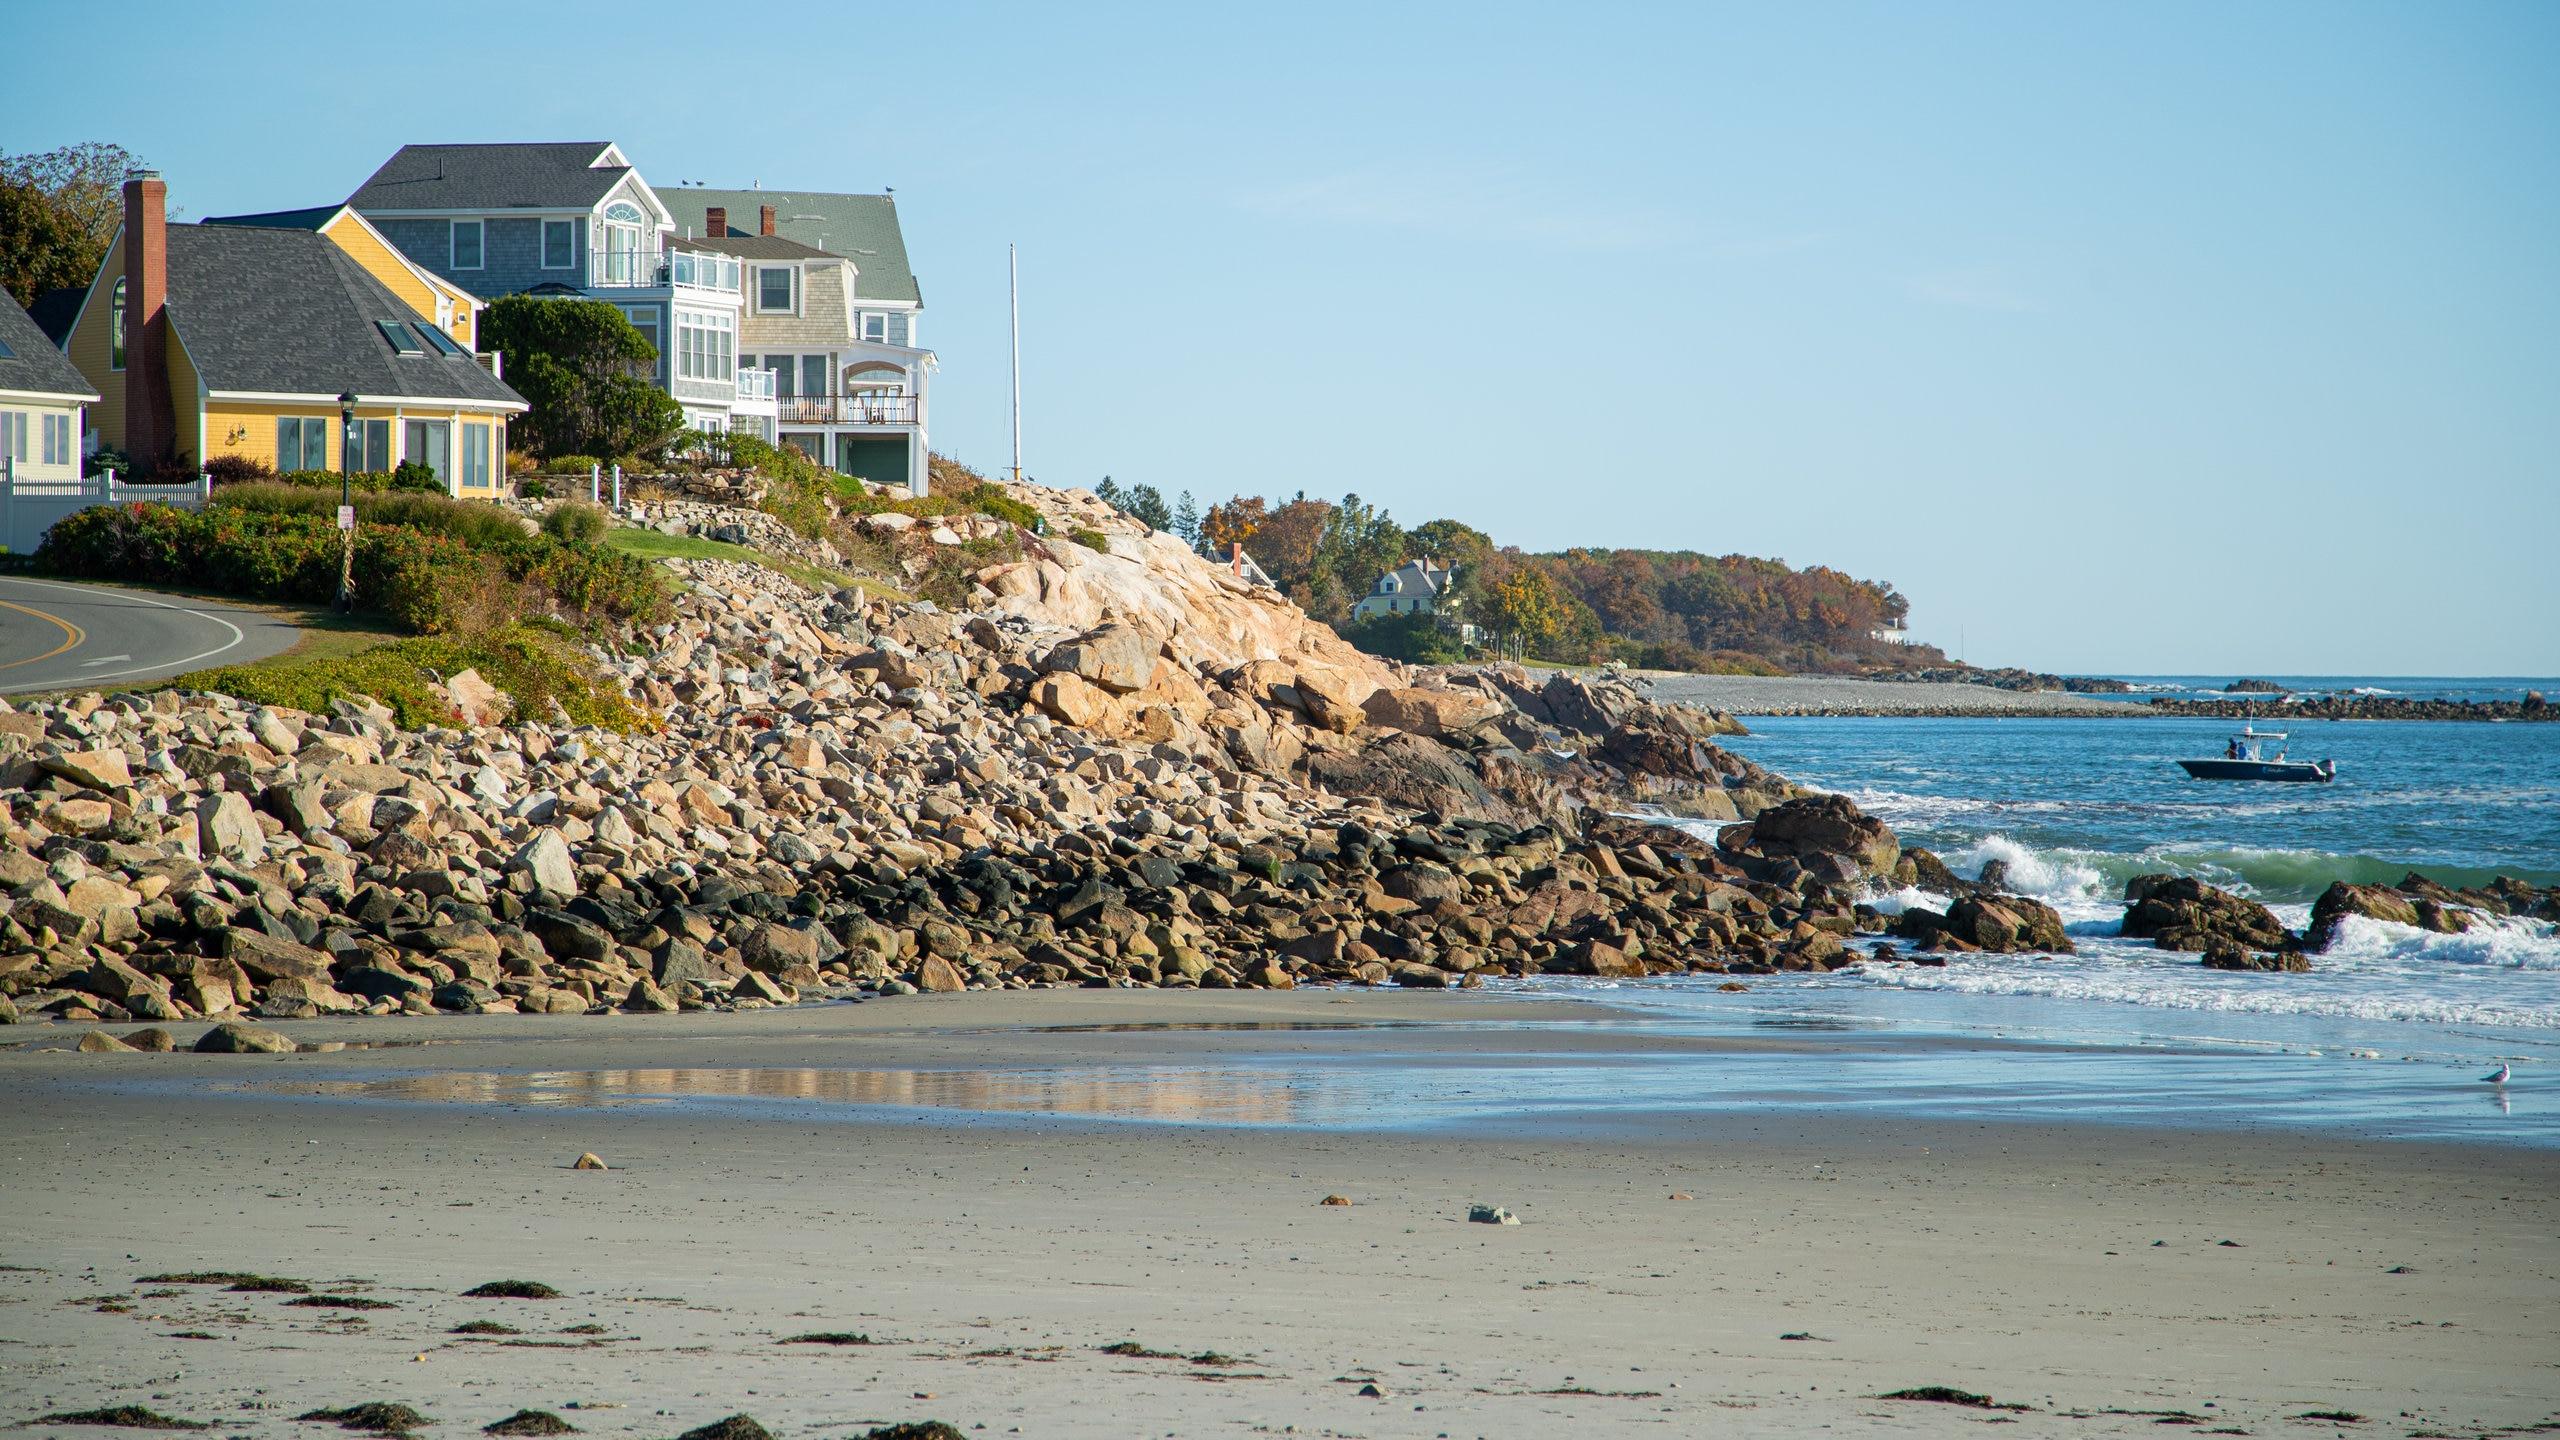 Short Sands Beach, York, Maine, United States of America